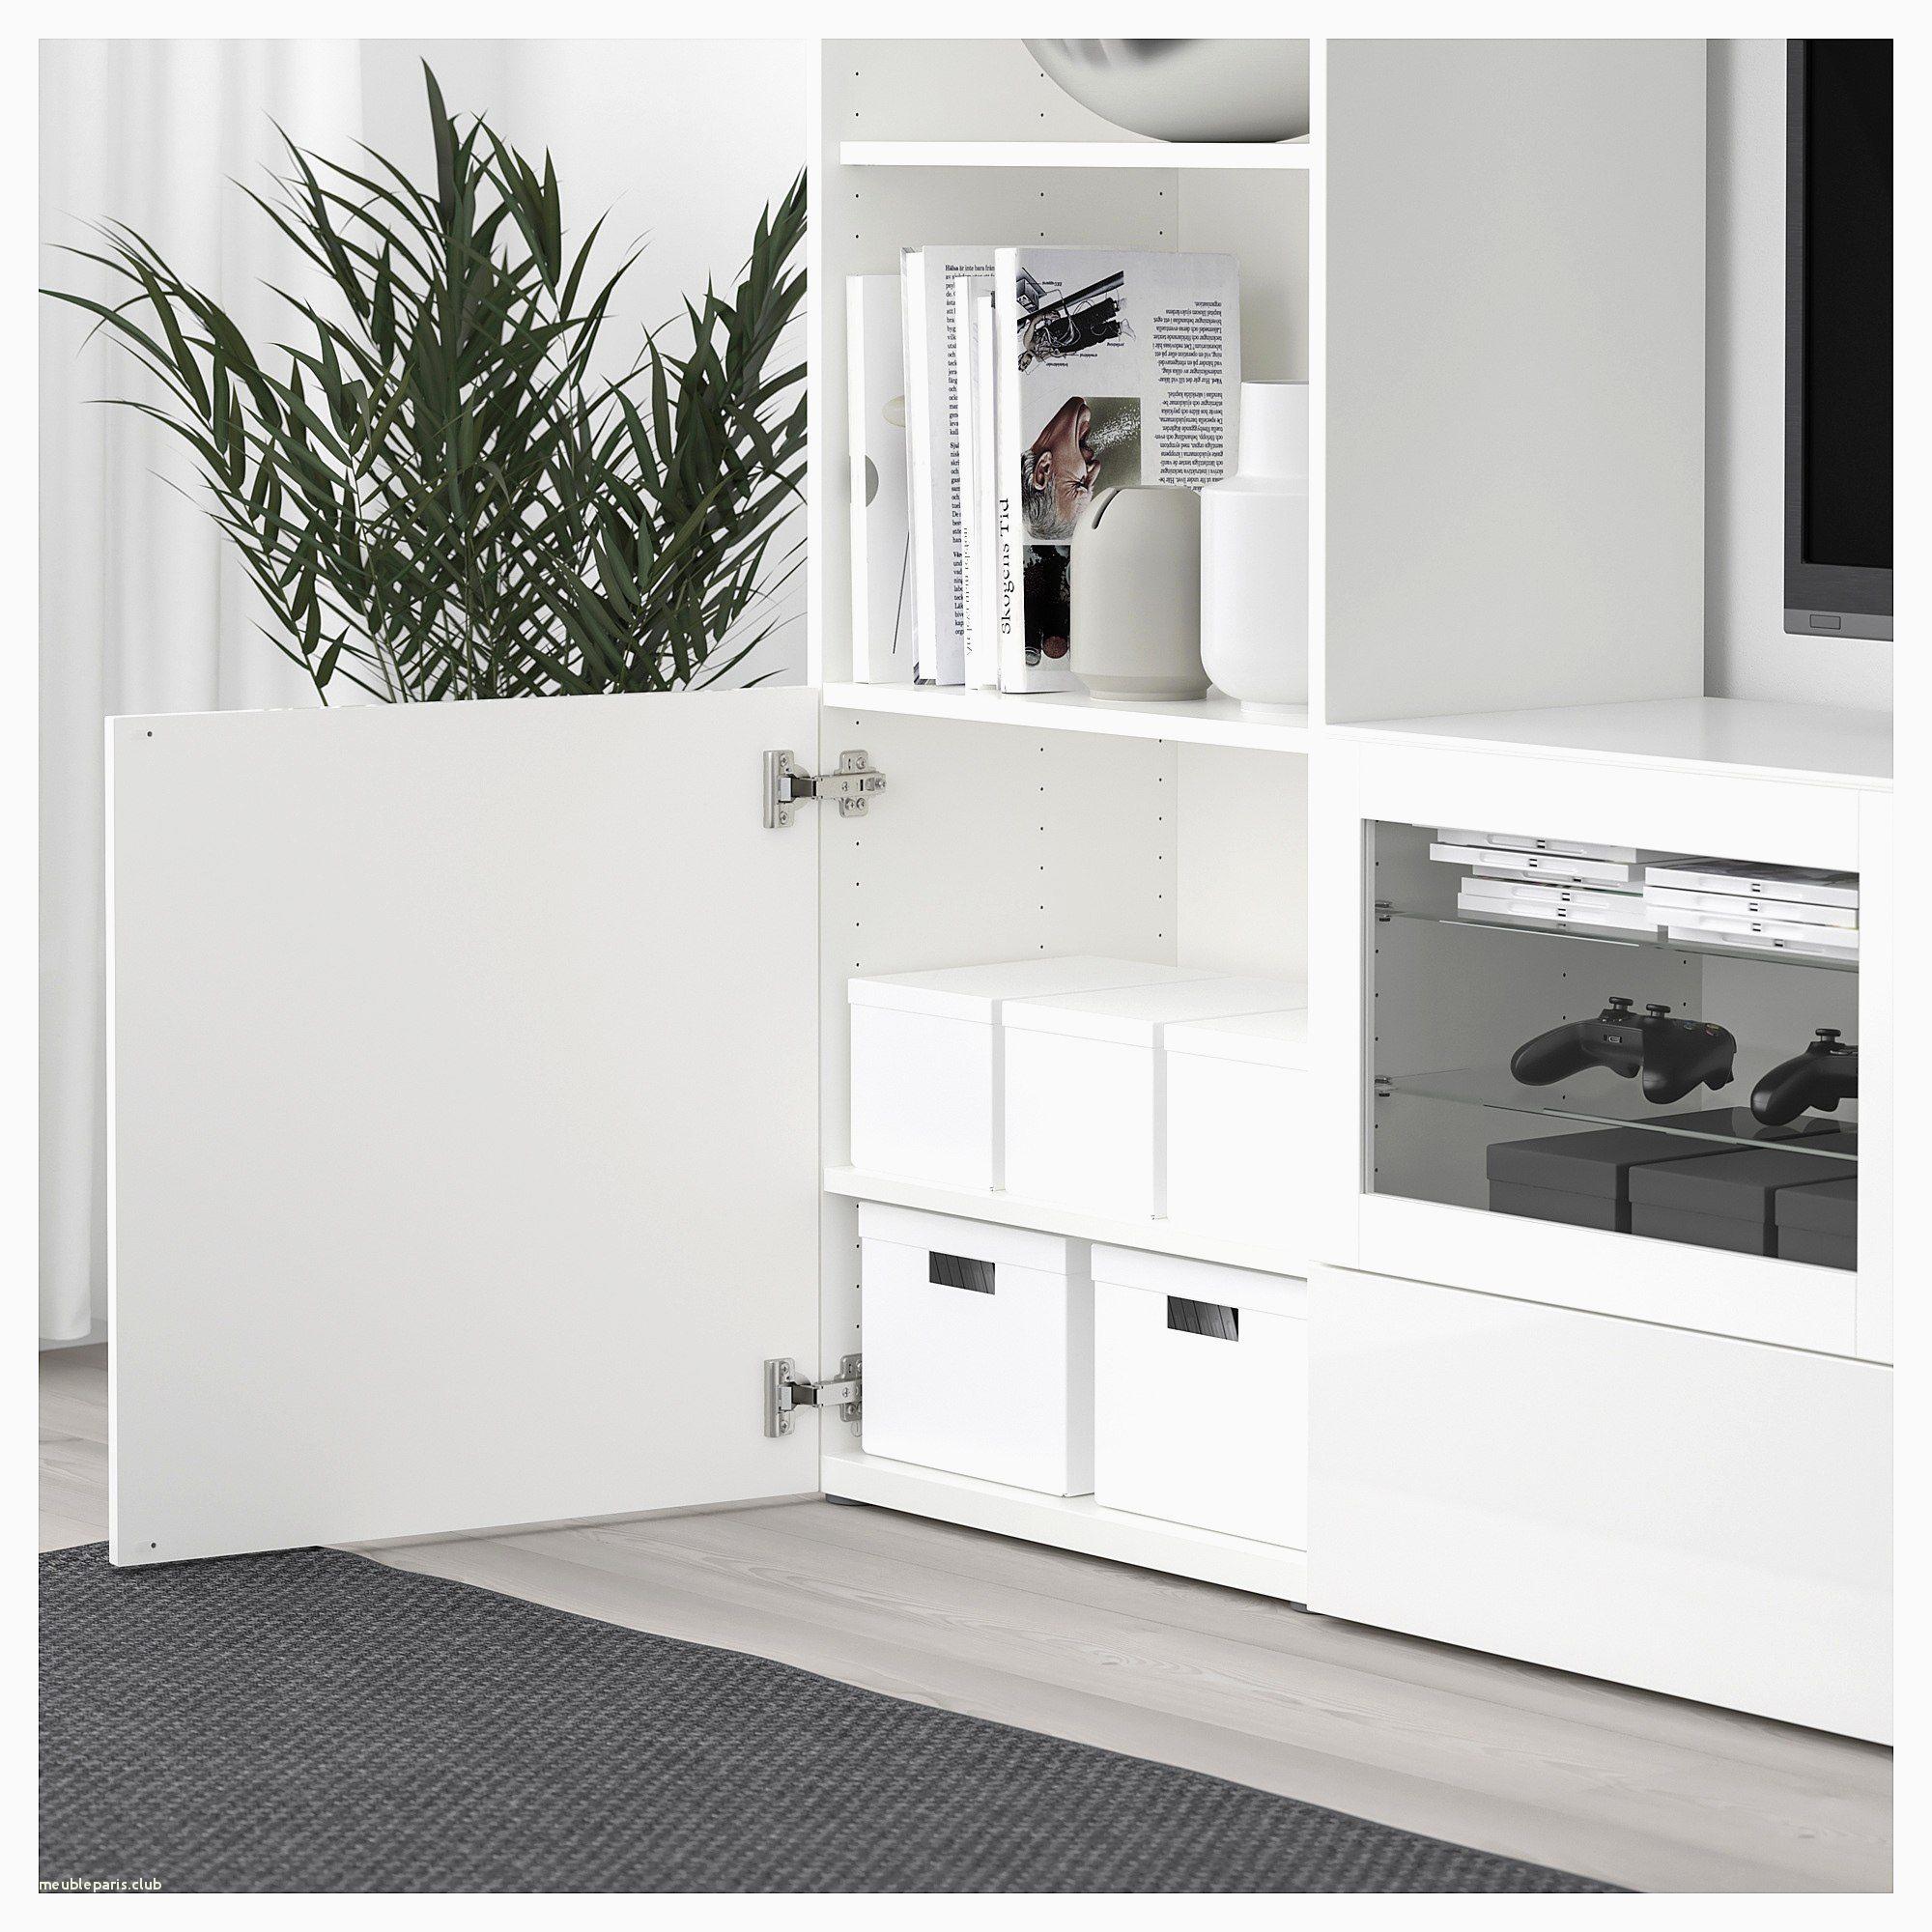 Ikea Lit Armoire Escamotable Luxury Lit Empilable Ikea Lit sommier